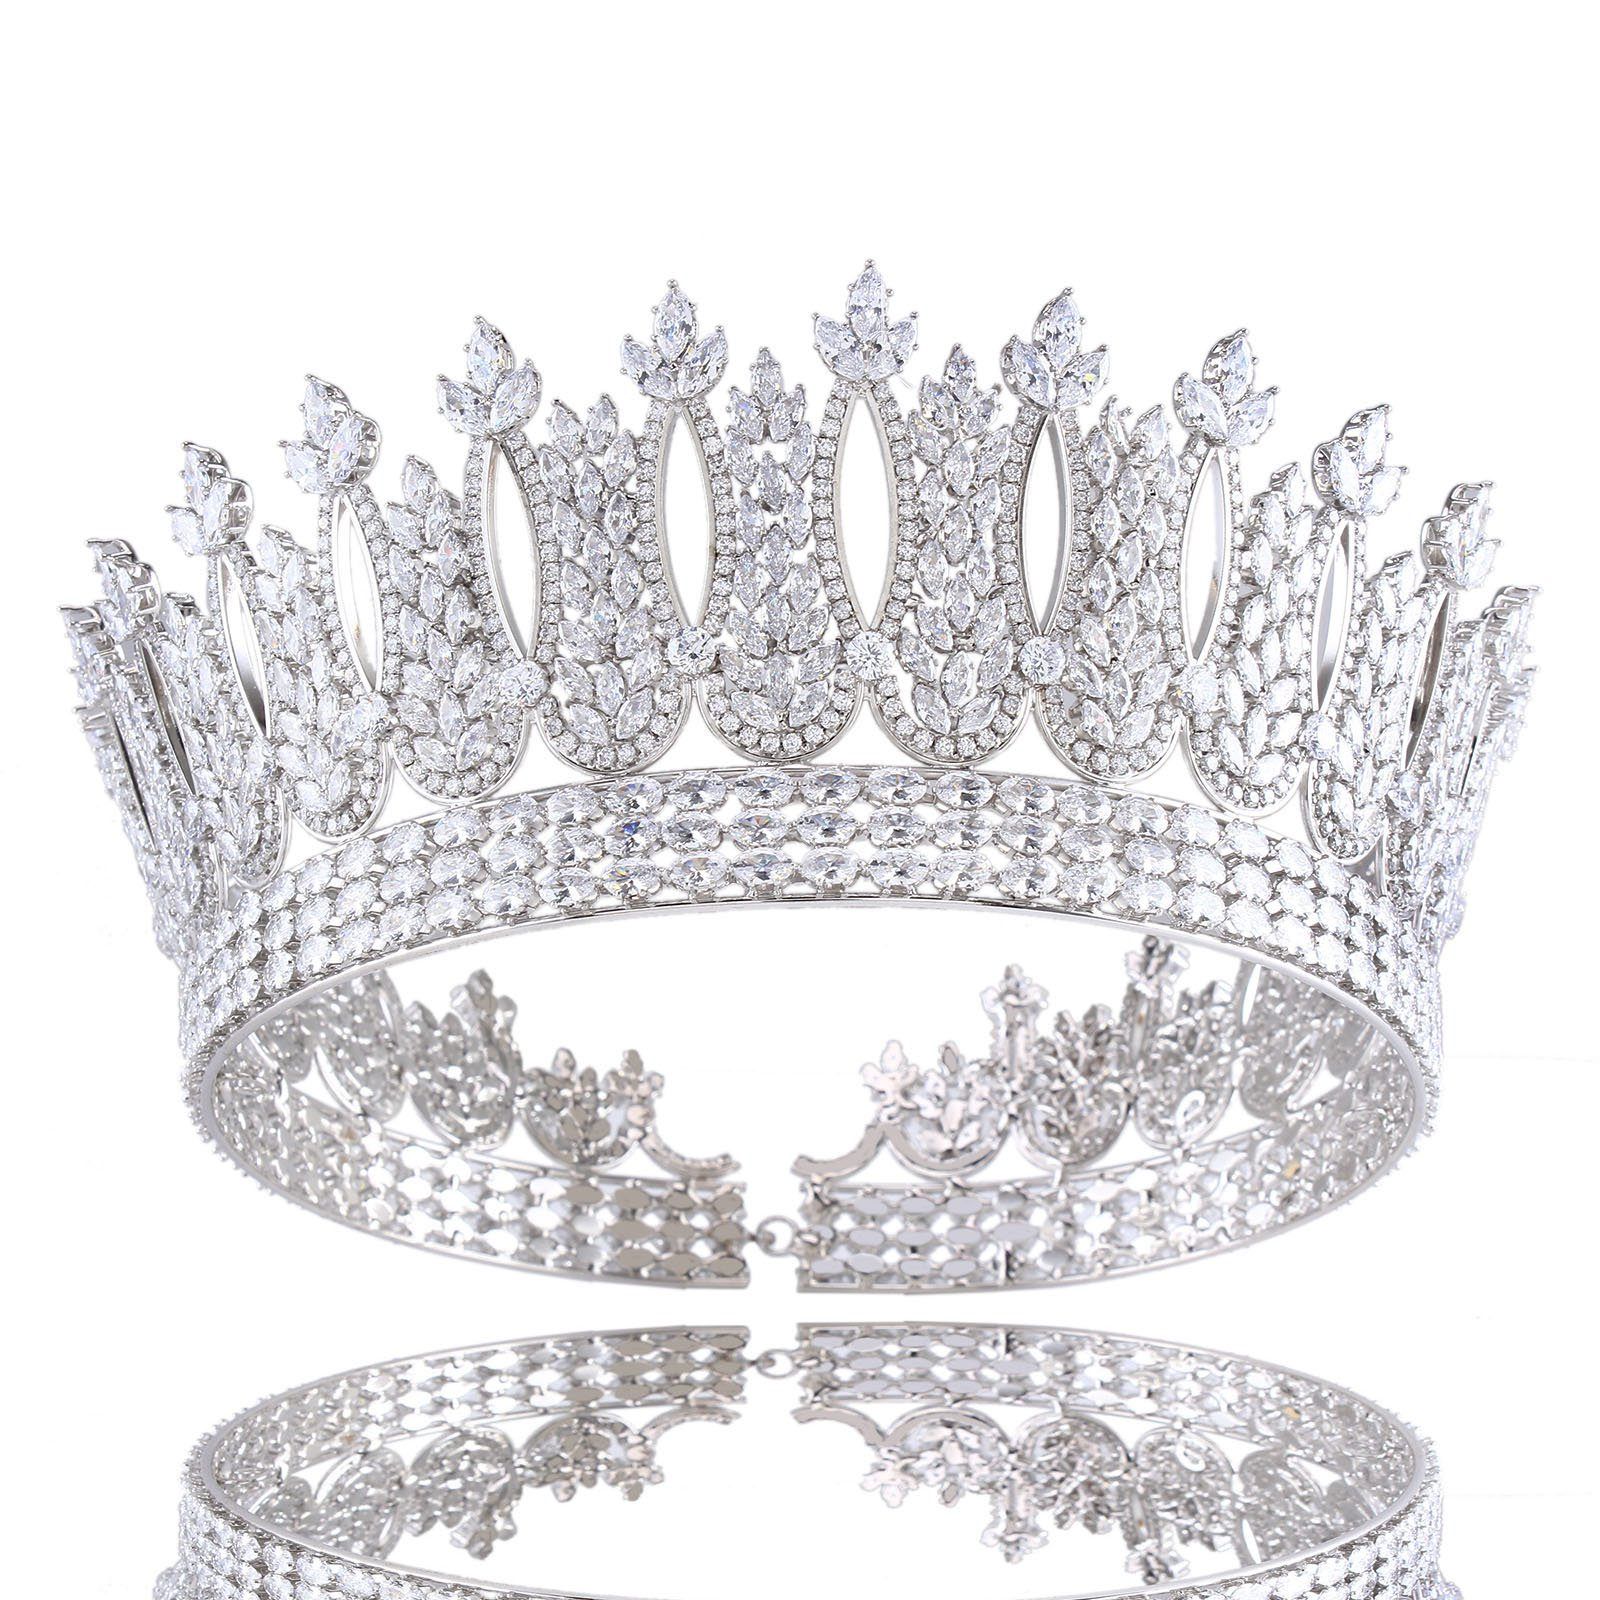 Santfe 2 3/5 ''Height Cubic Zirconia CZ Wedding Bride Crown Tiara Headband Hair Jewelry Accessories